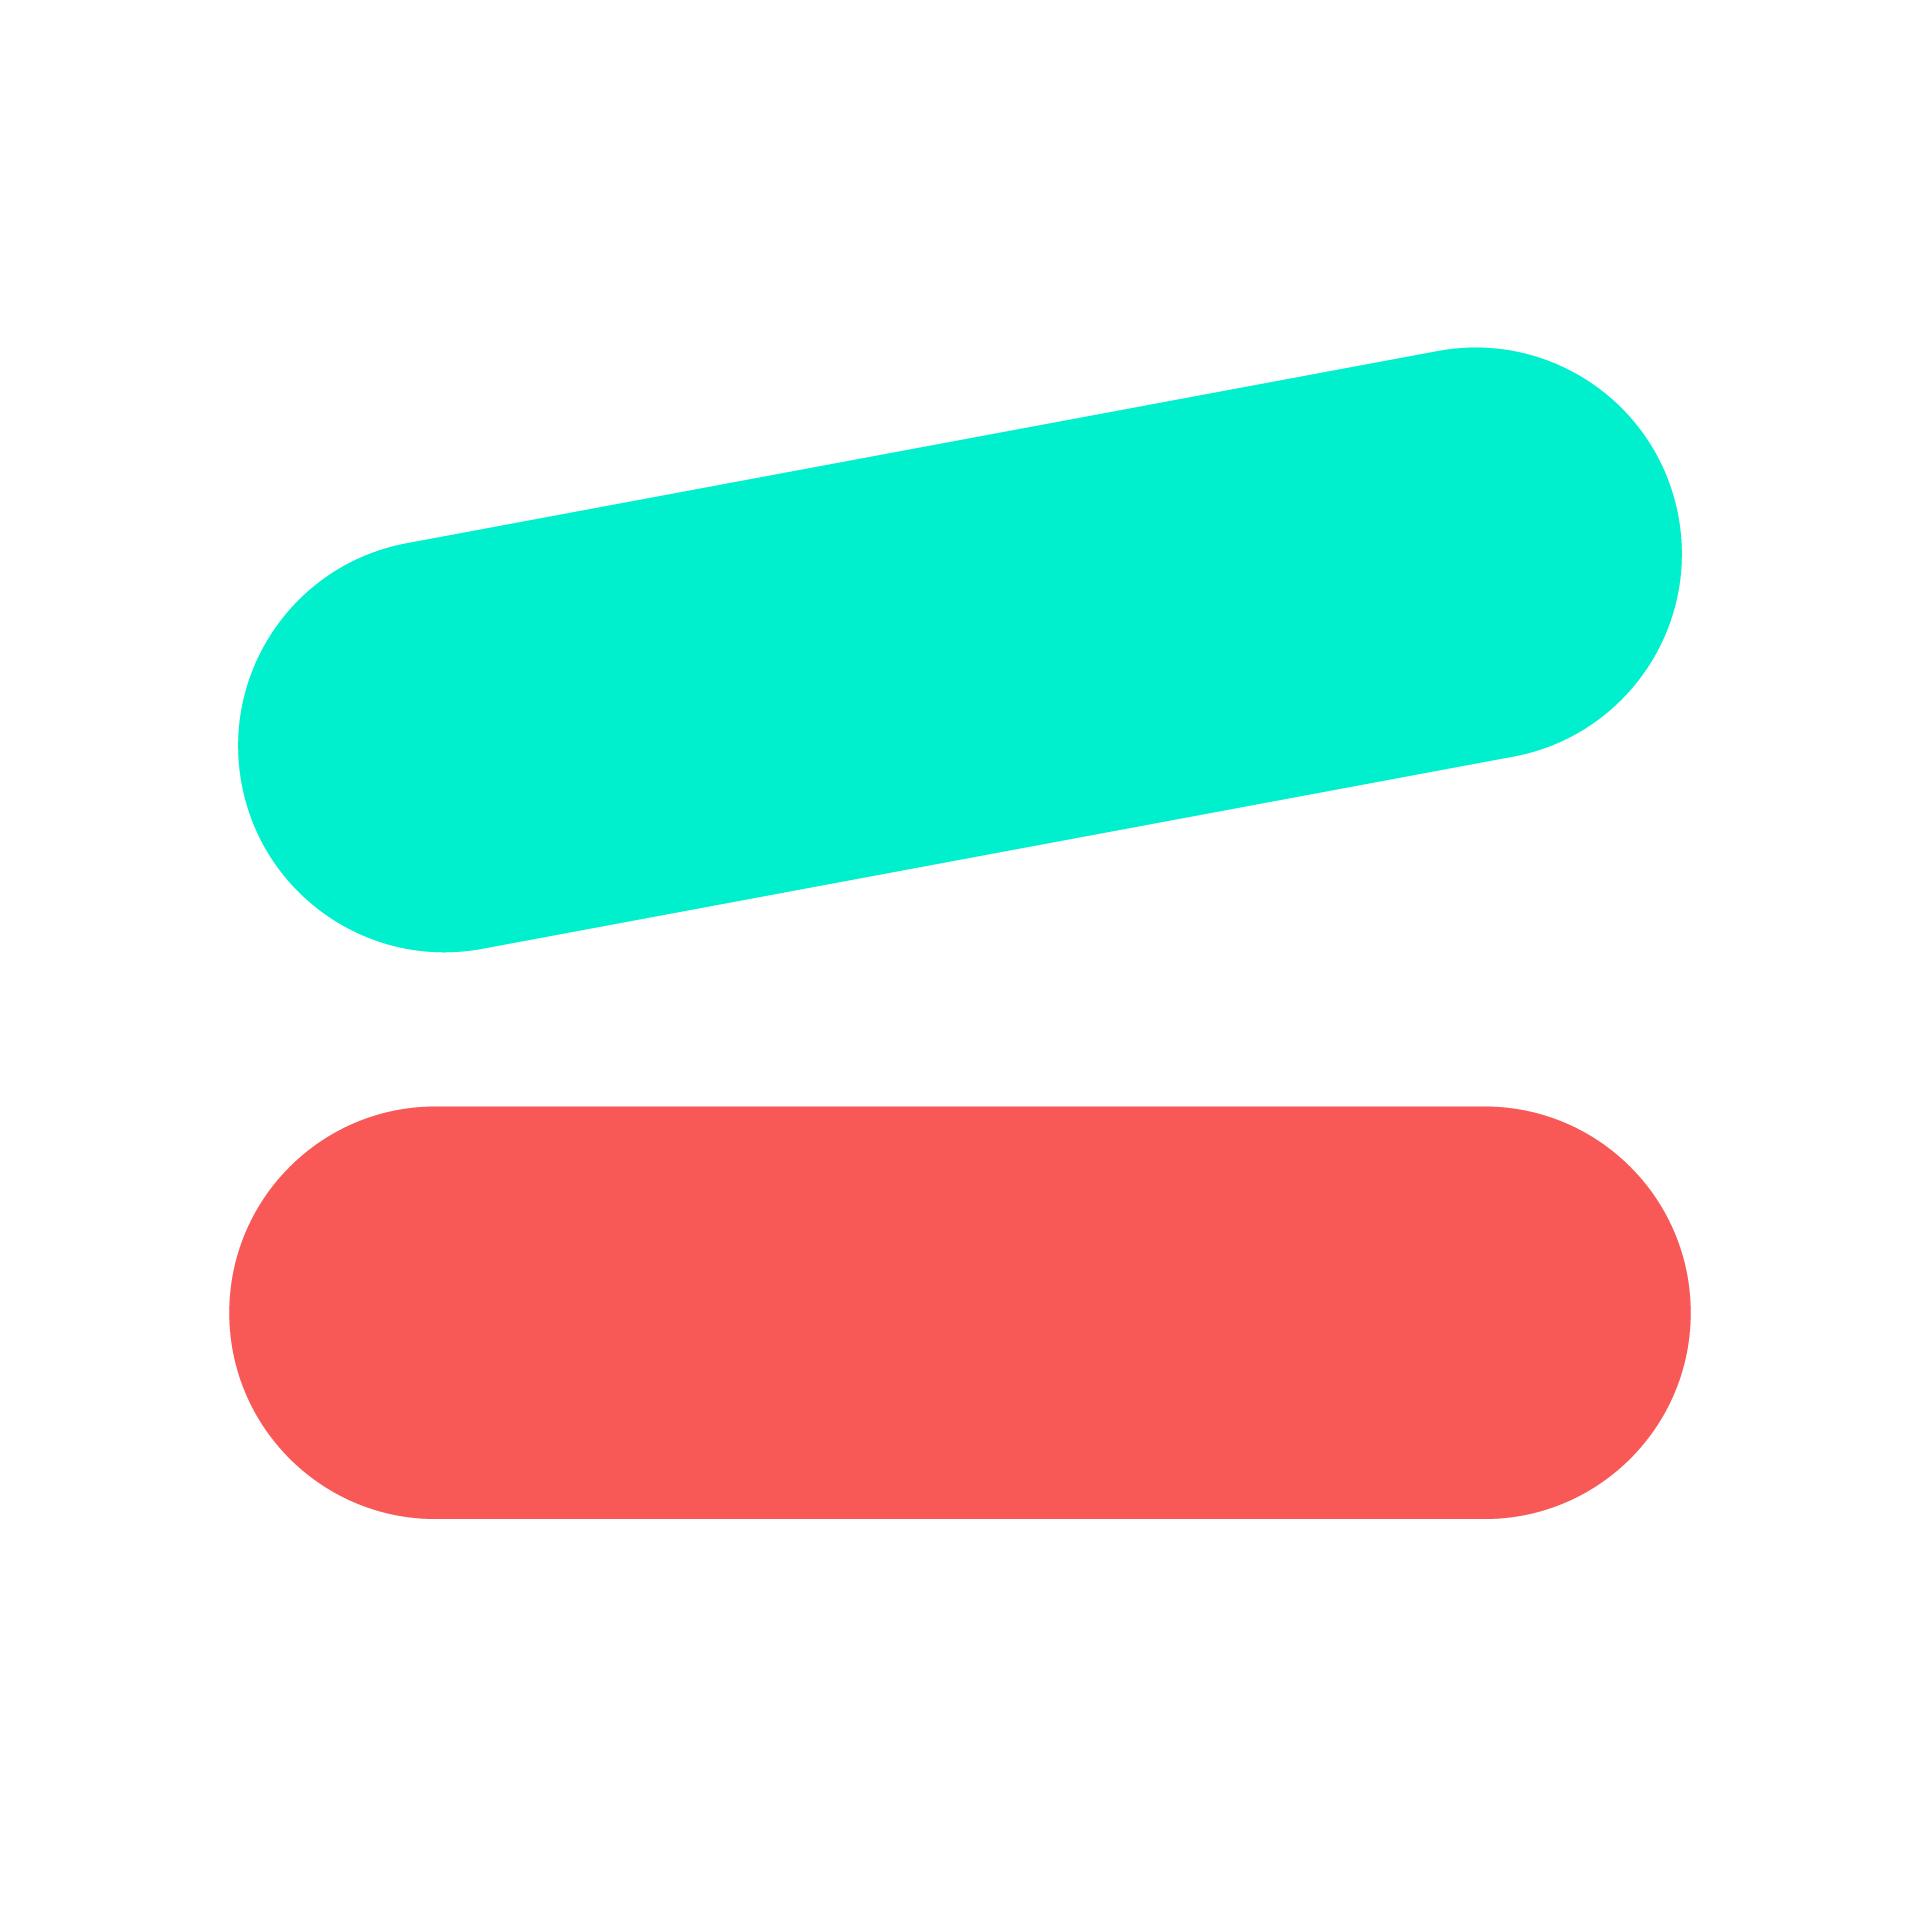 02 Standard_WhiteBG_1.png